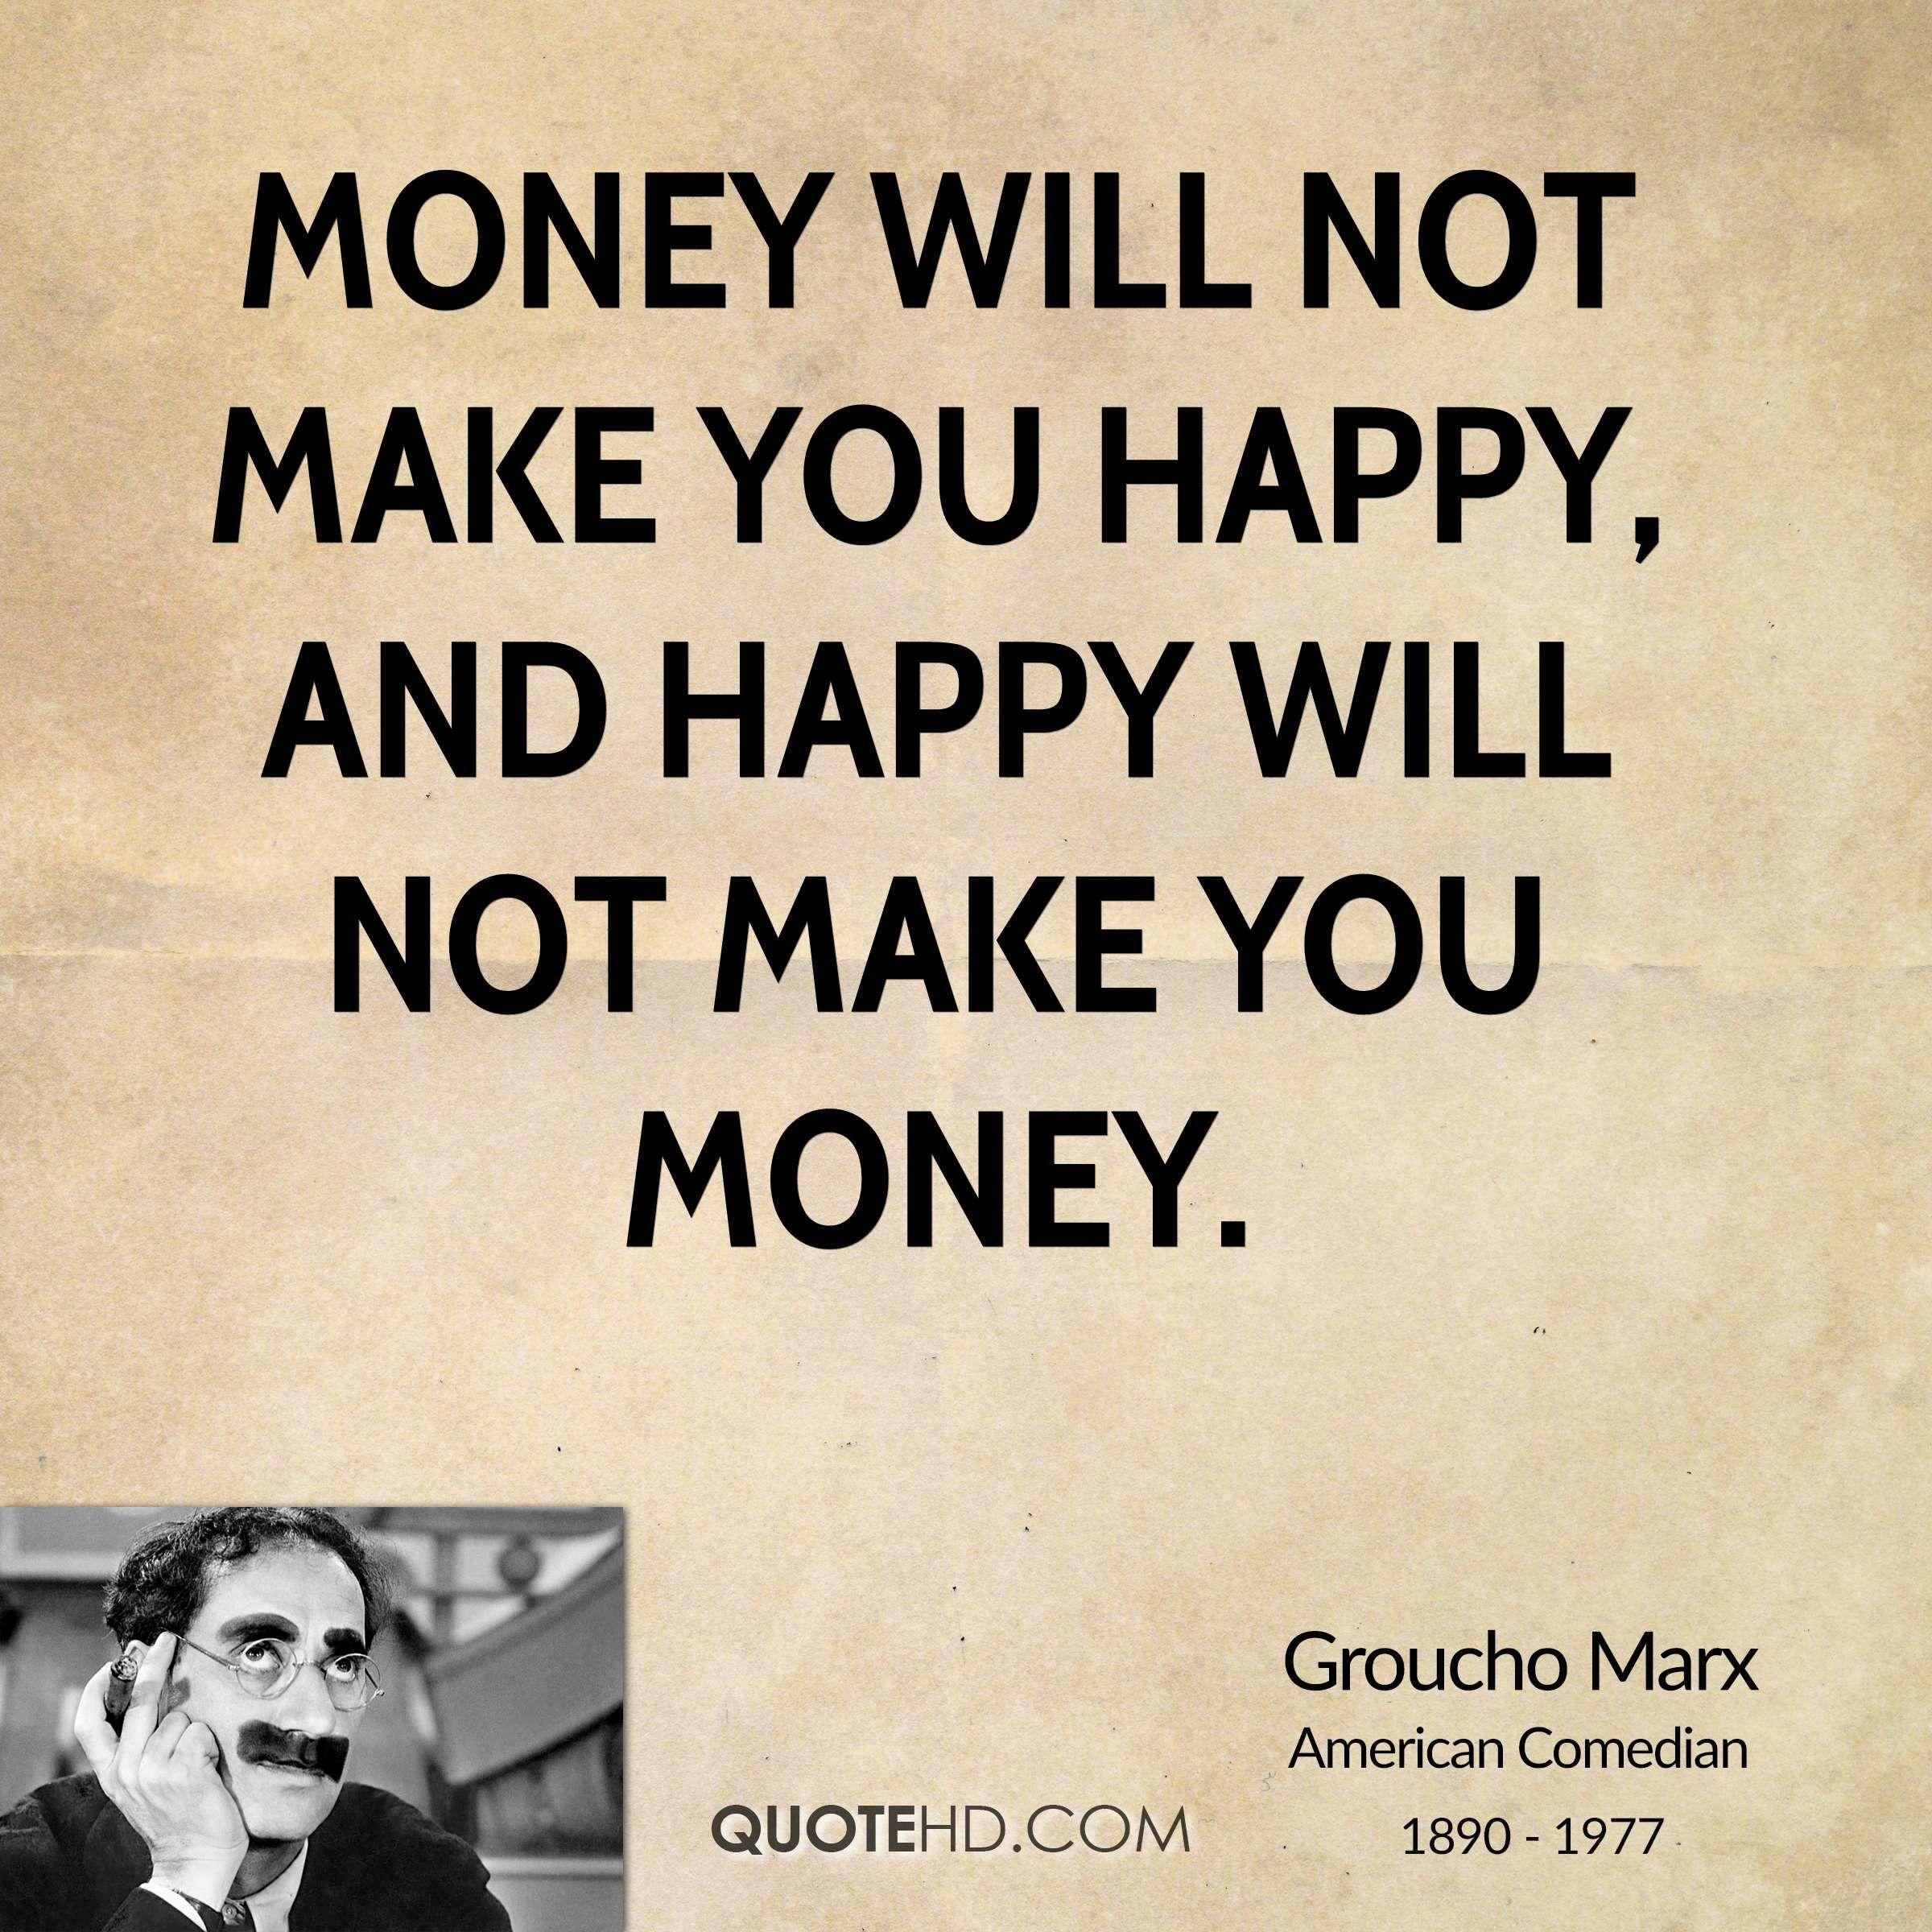 Funny Groucho Marx Quotes: Groucho Marx Quotes - Google Search